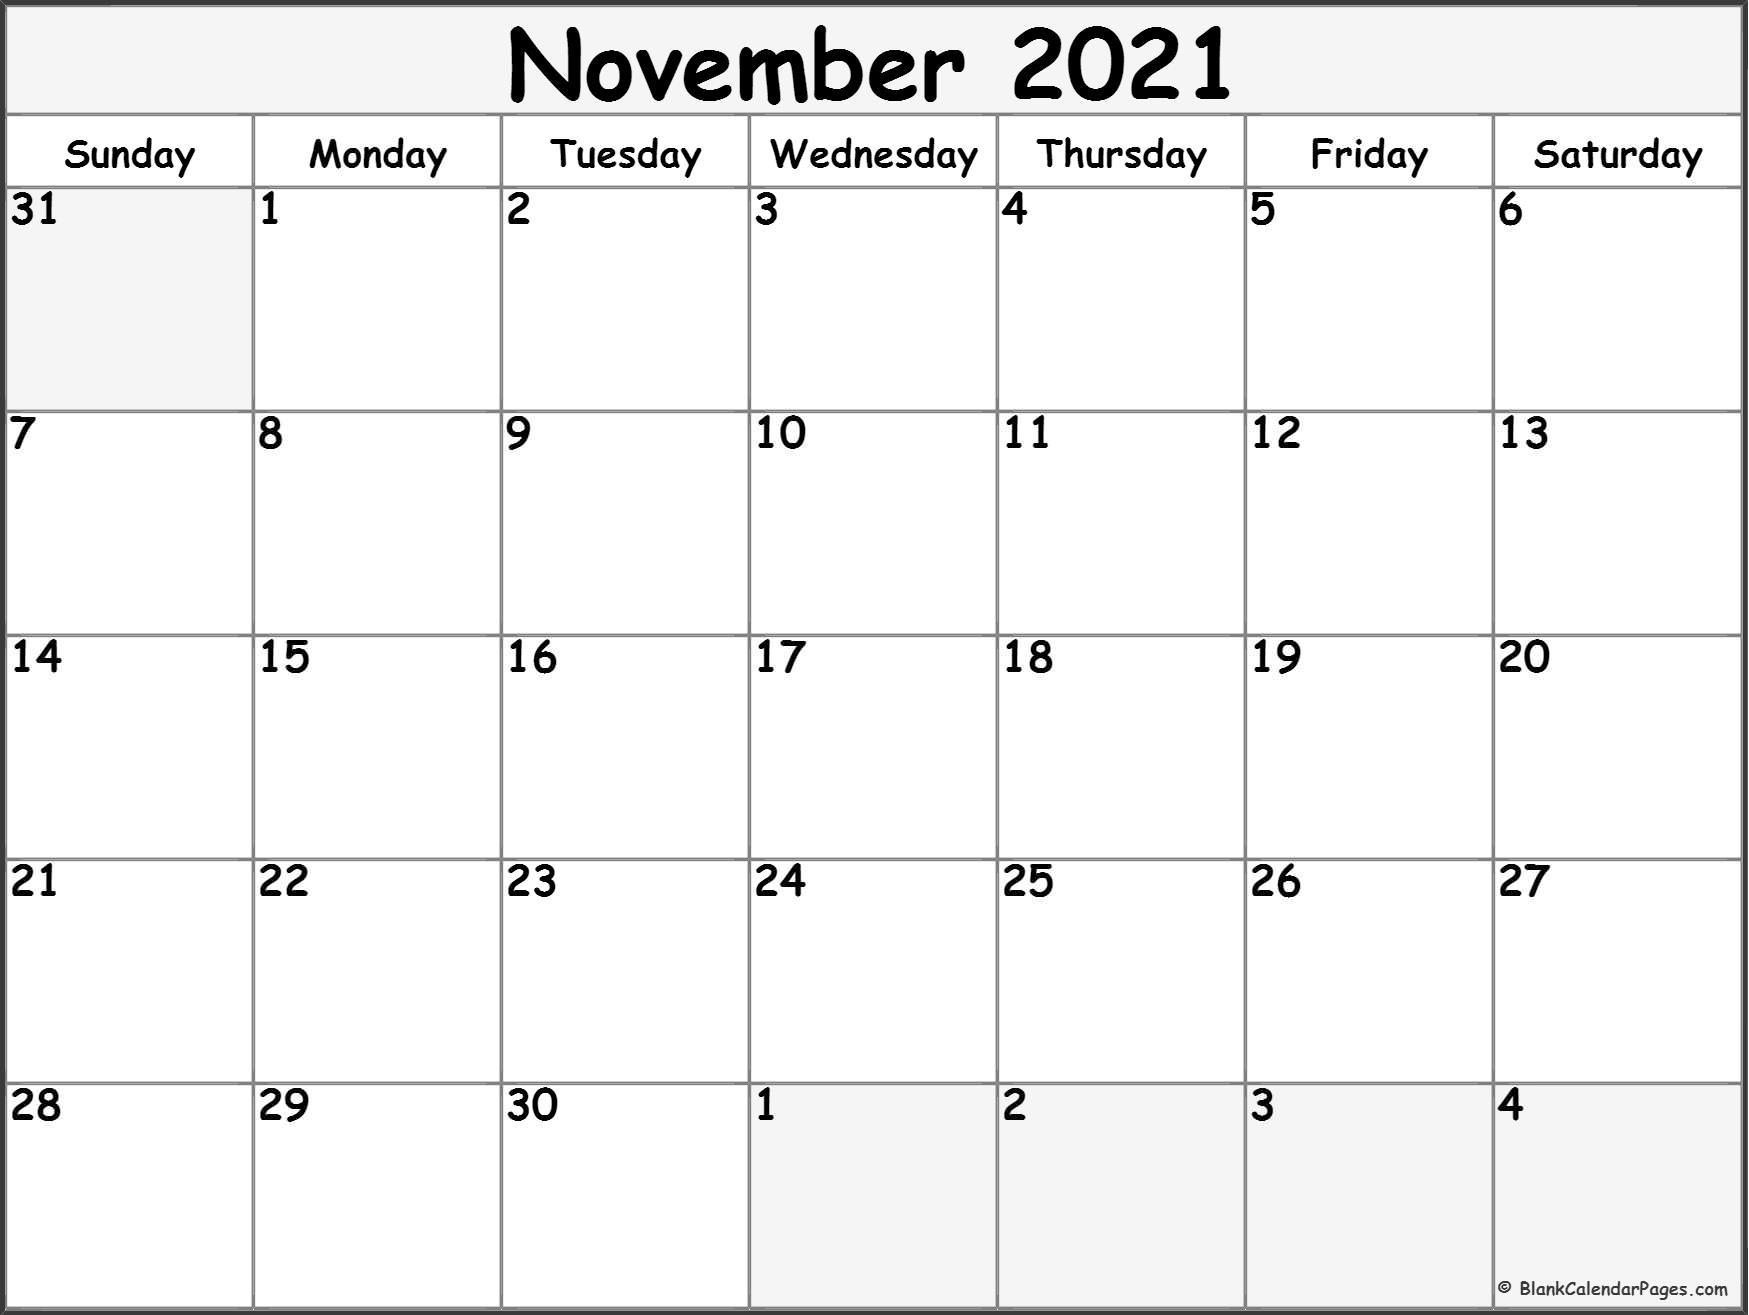 November 2021 Calendar   Free Printable Monthly Calendars Within Calendar With November 2021 Mexican Names